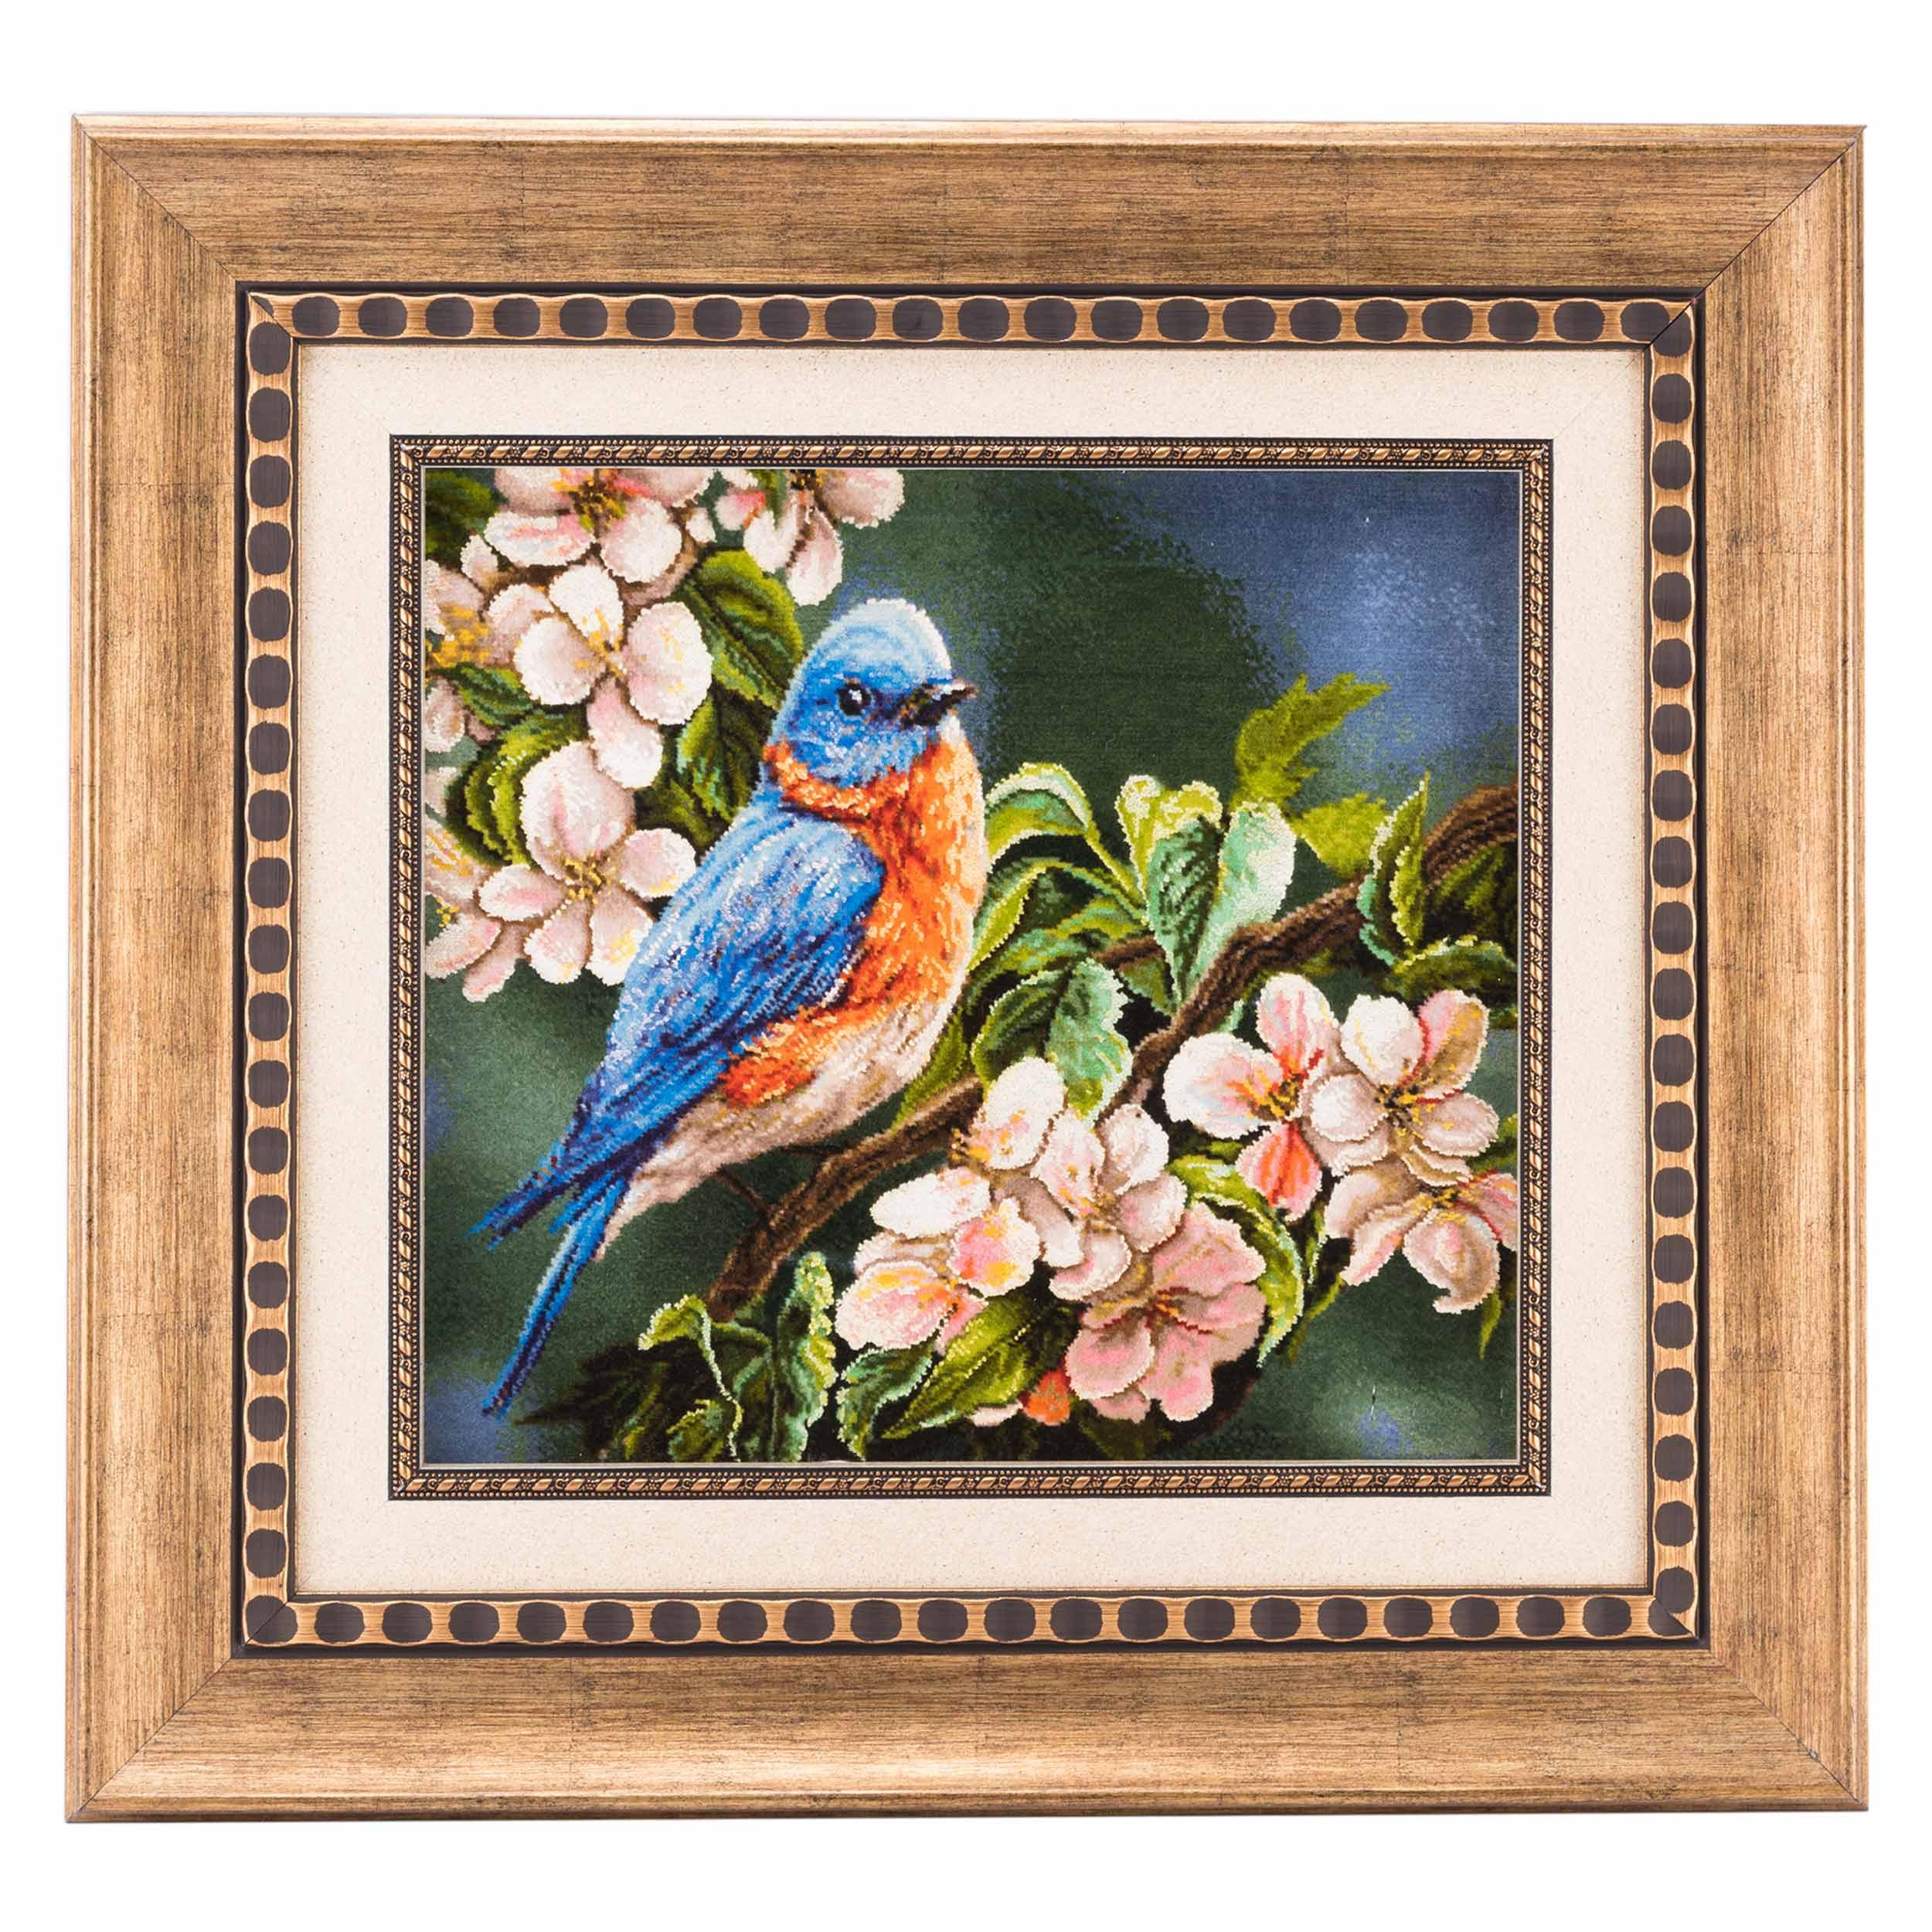 تابلو فرش دستباف پرنده سی پرشیا کد 901354